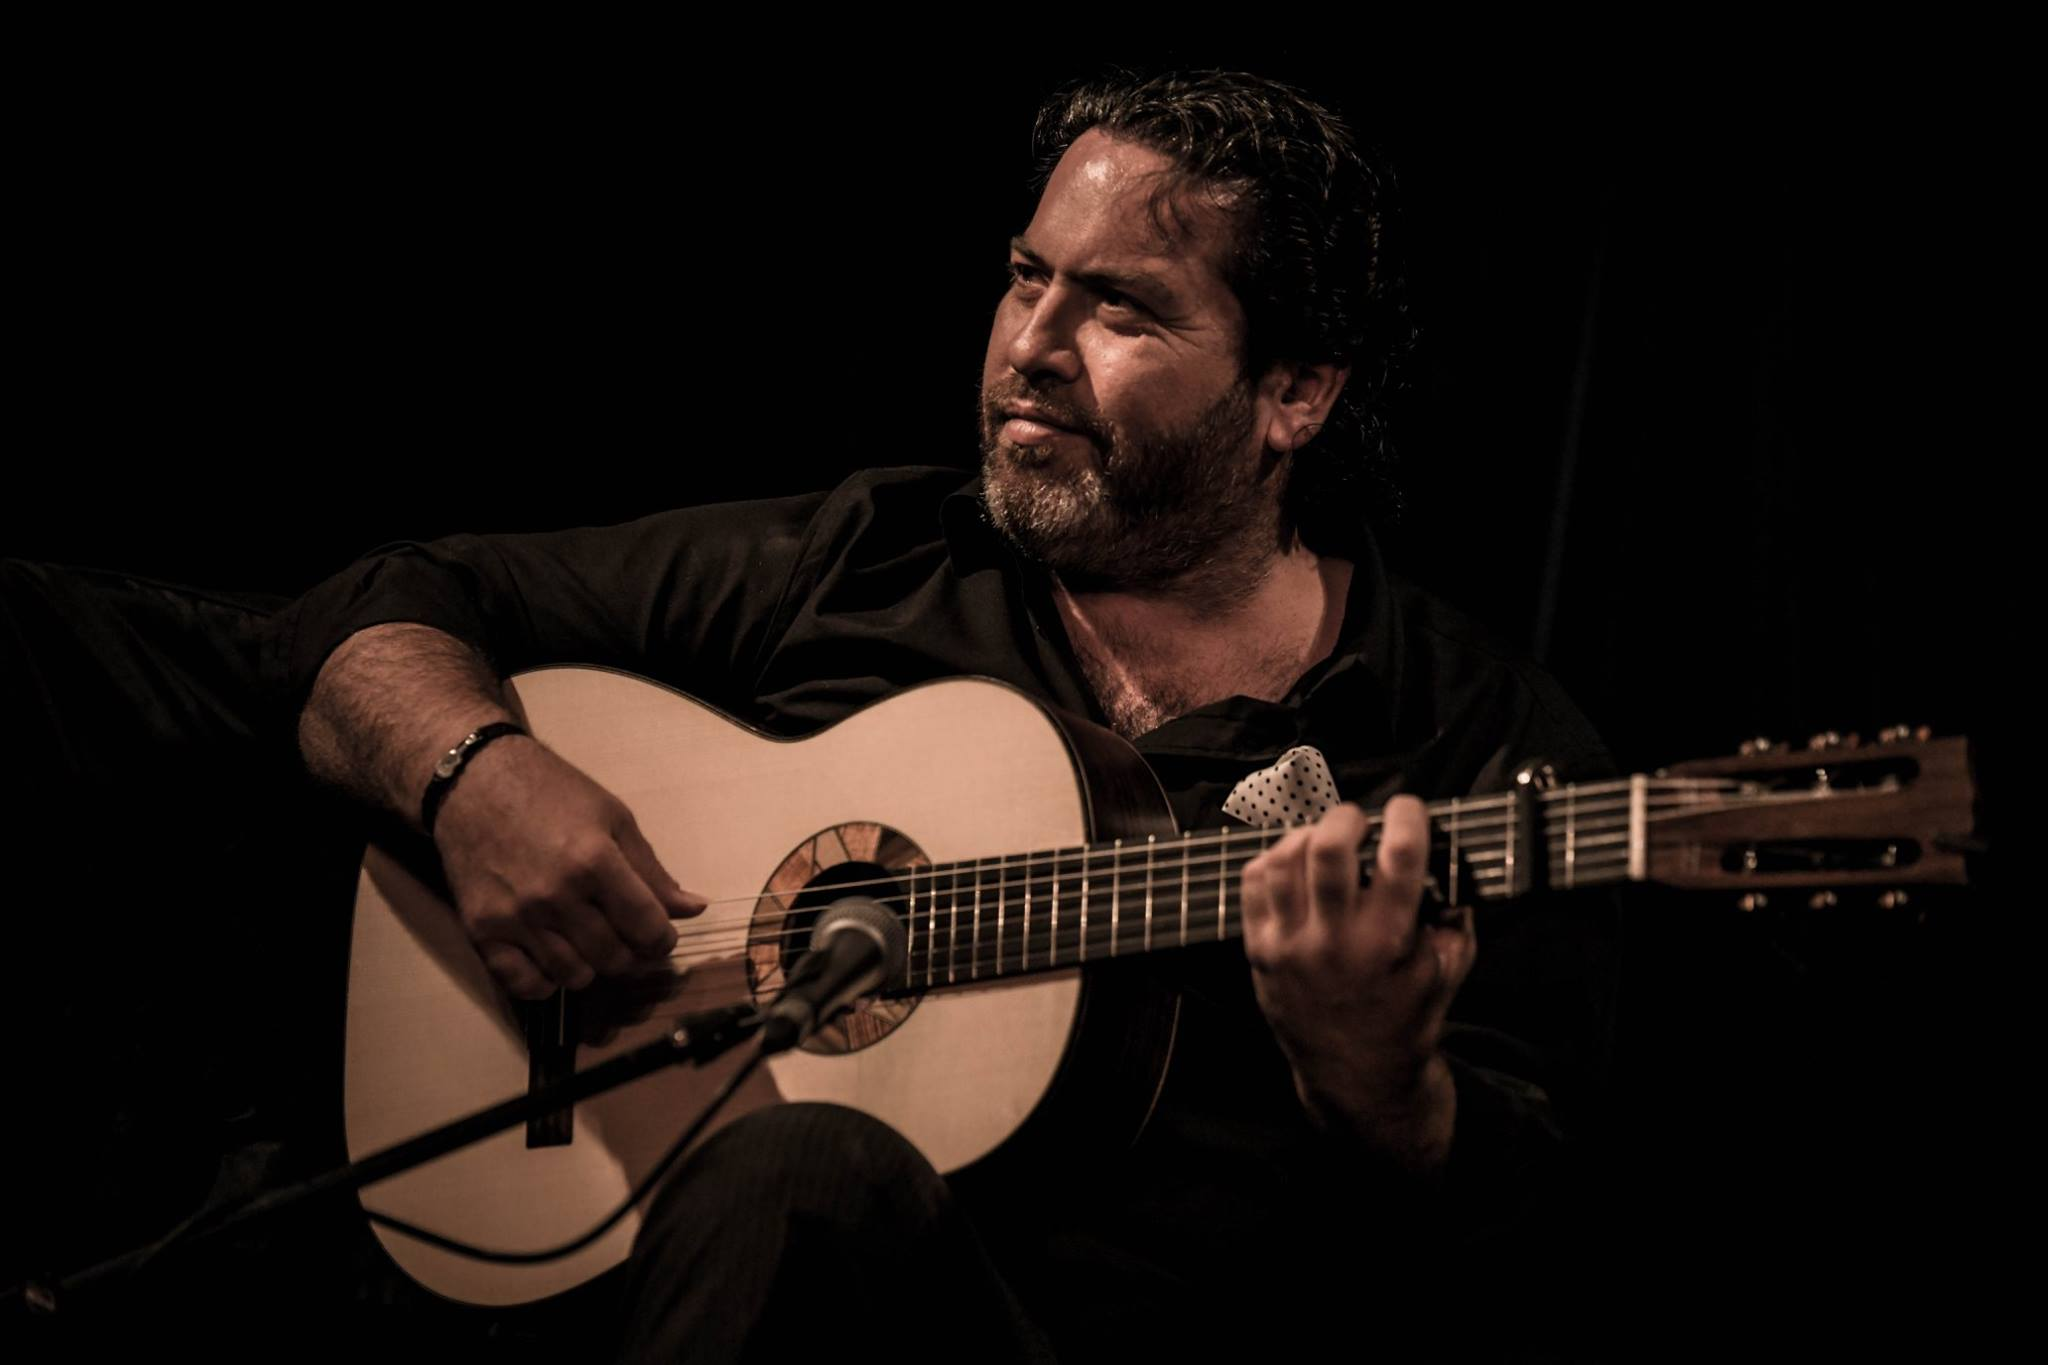 Flamenco Guitar played by Paco Lara